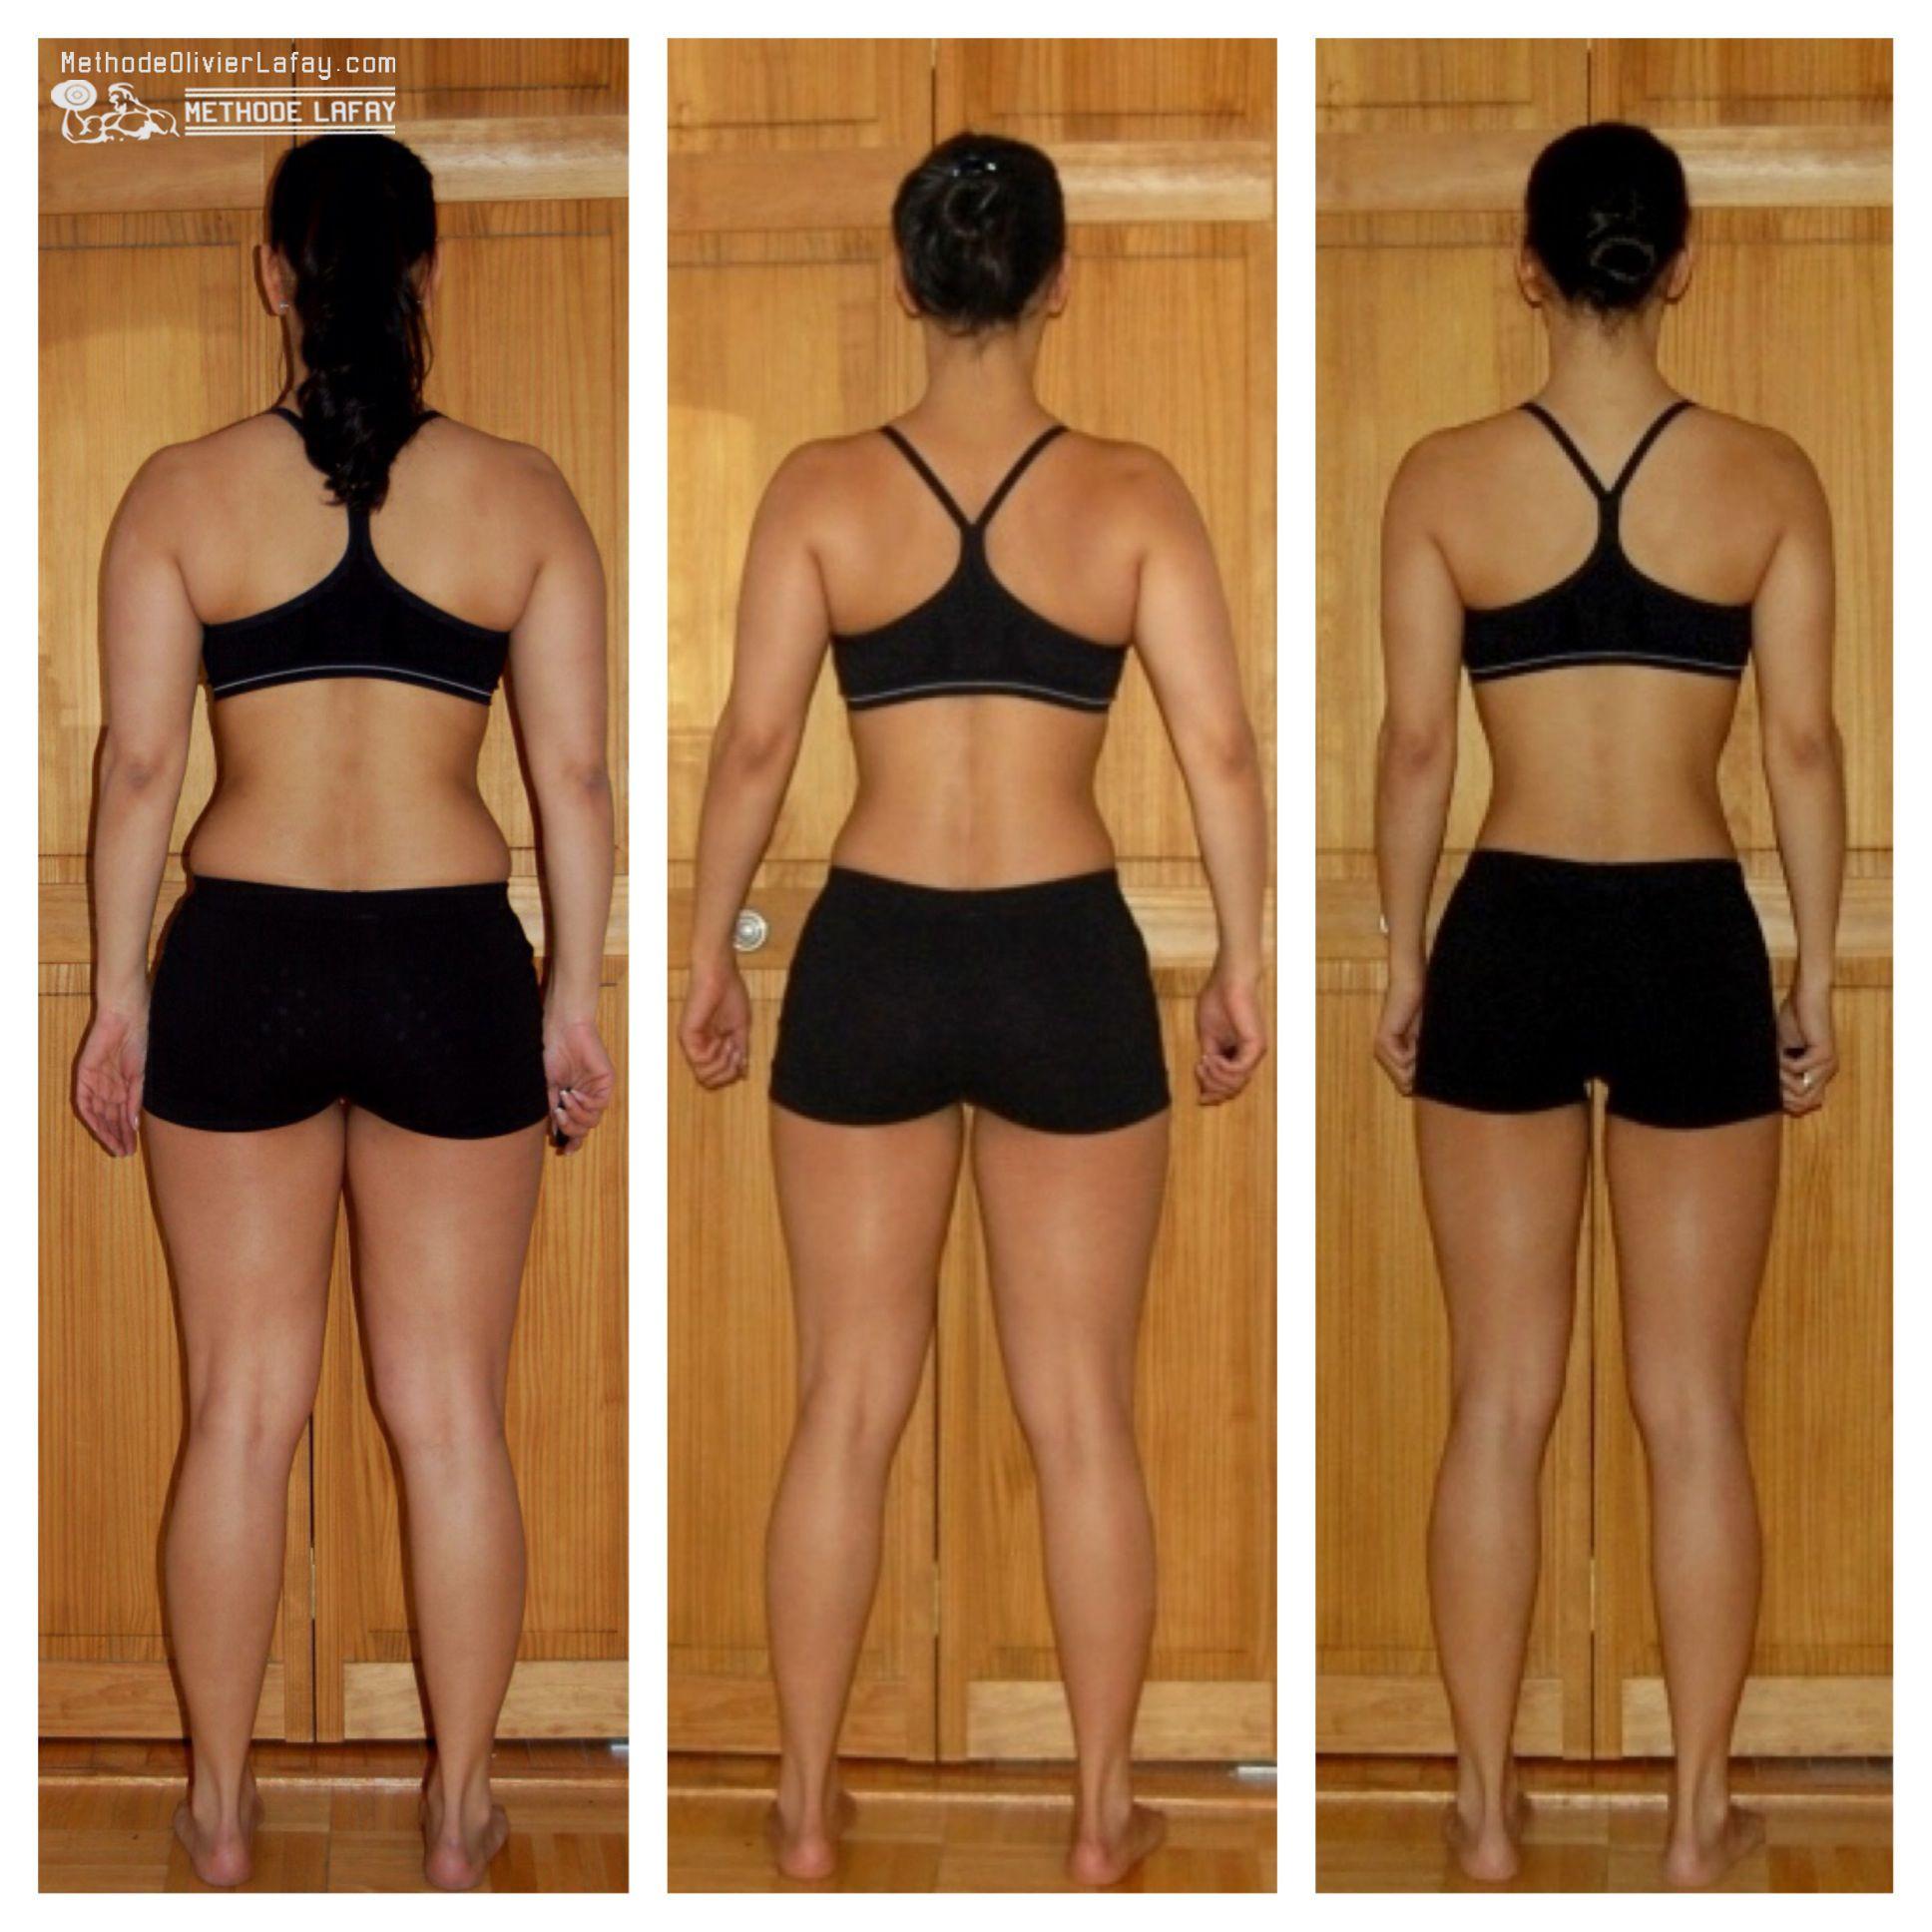 alter musculation femme